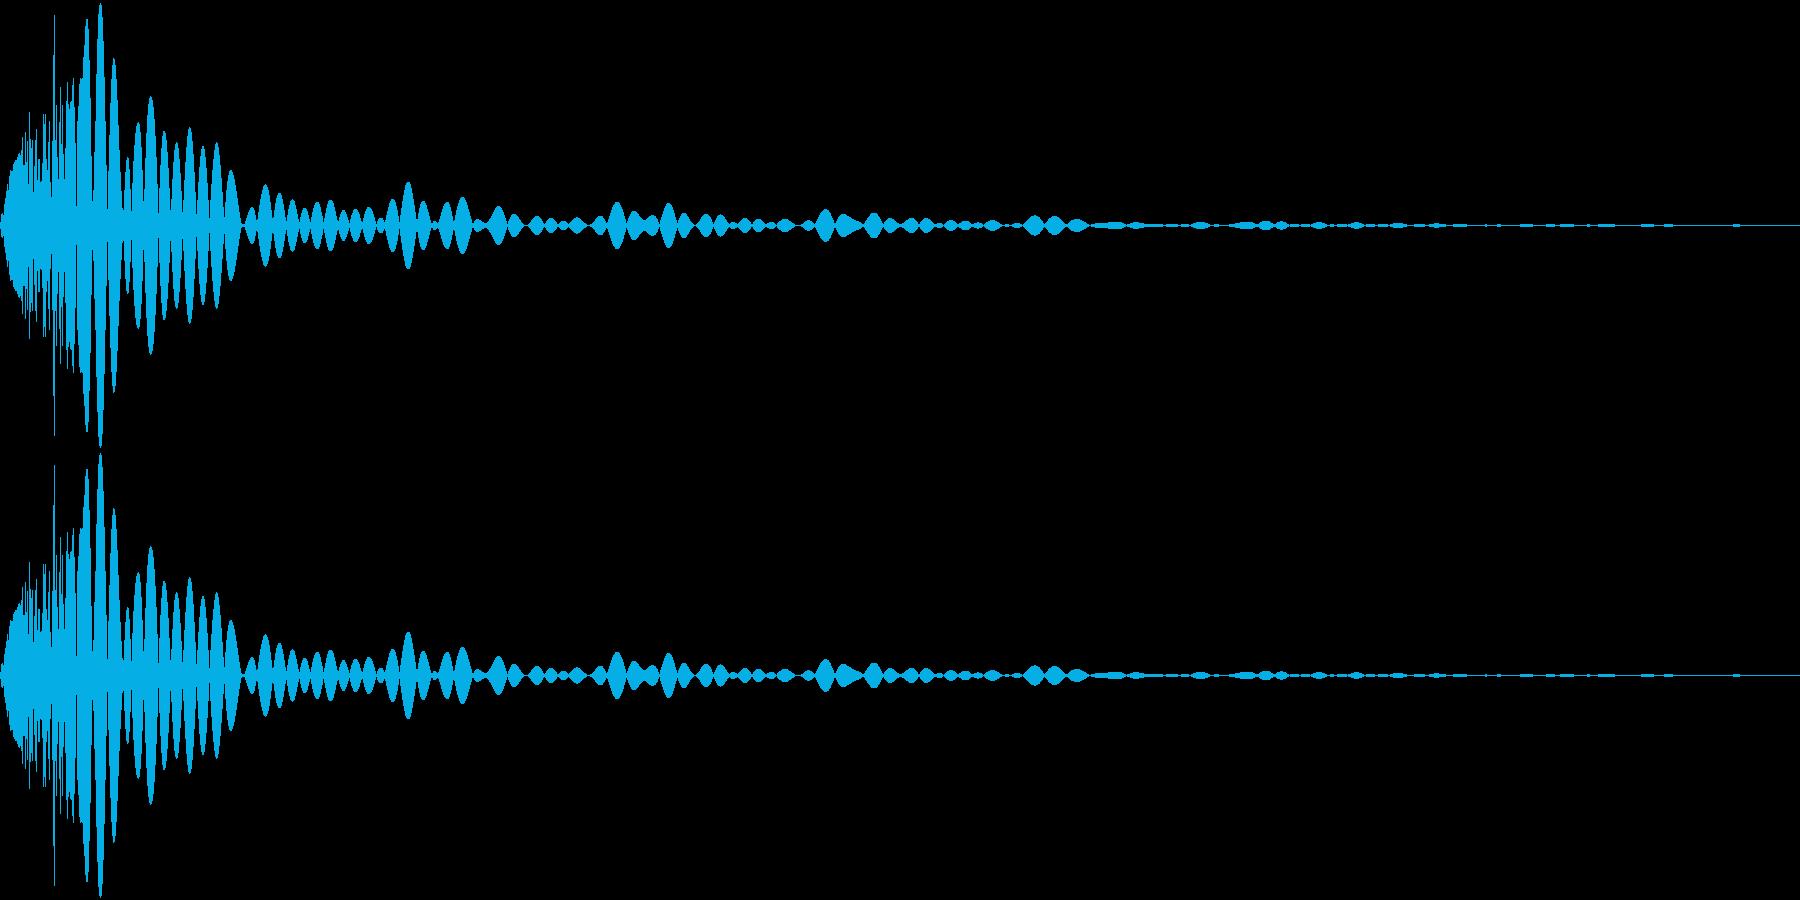 DTM Tom 4 オリジナル音源の再生済みの波形